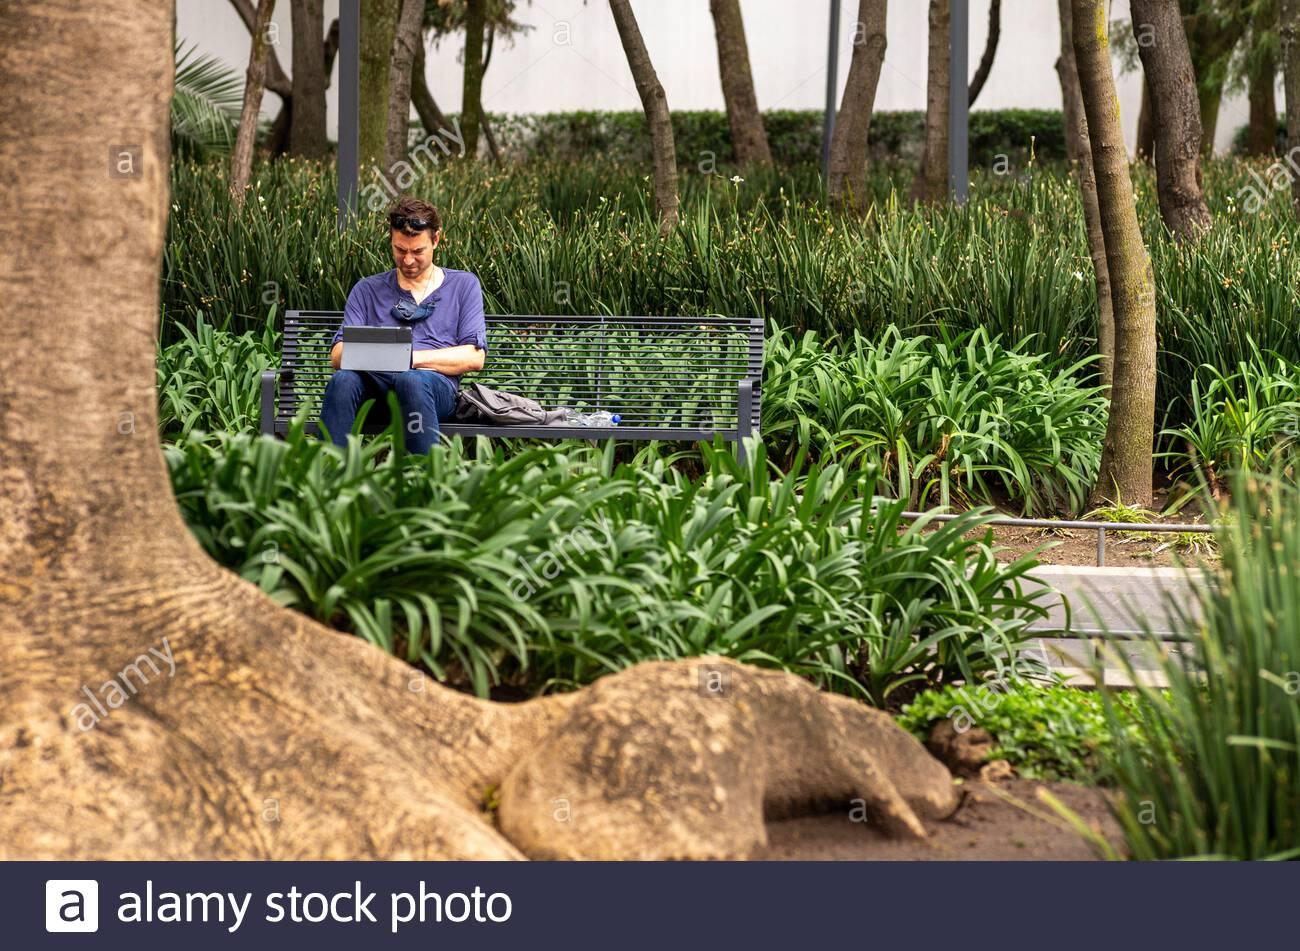 A man works remotely on his laptop in Mexico City's Parque De La Bombilla. Stock Photo